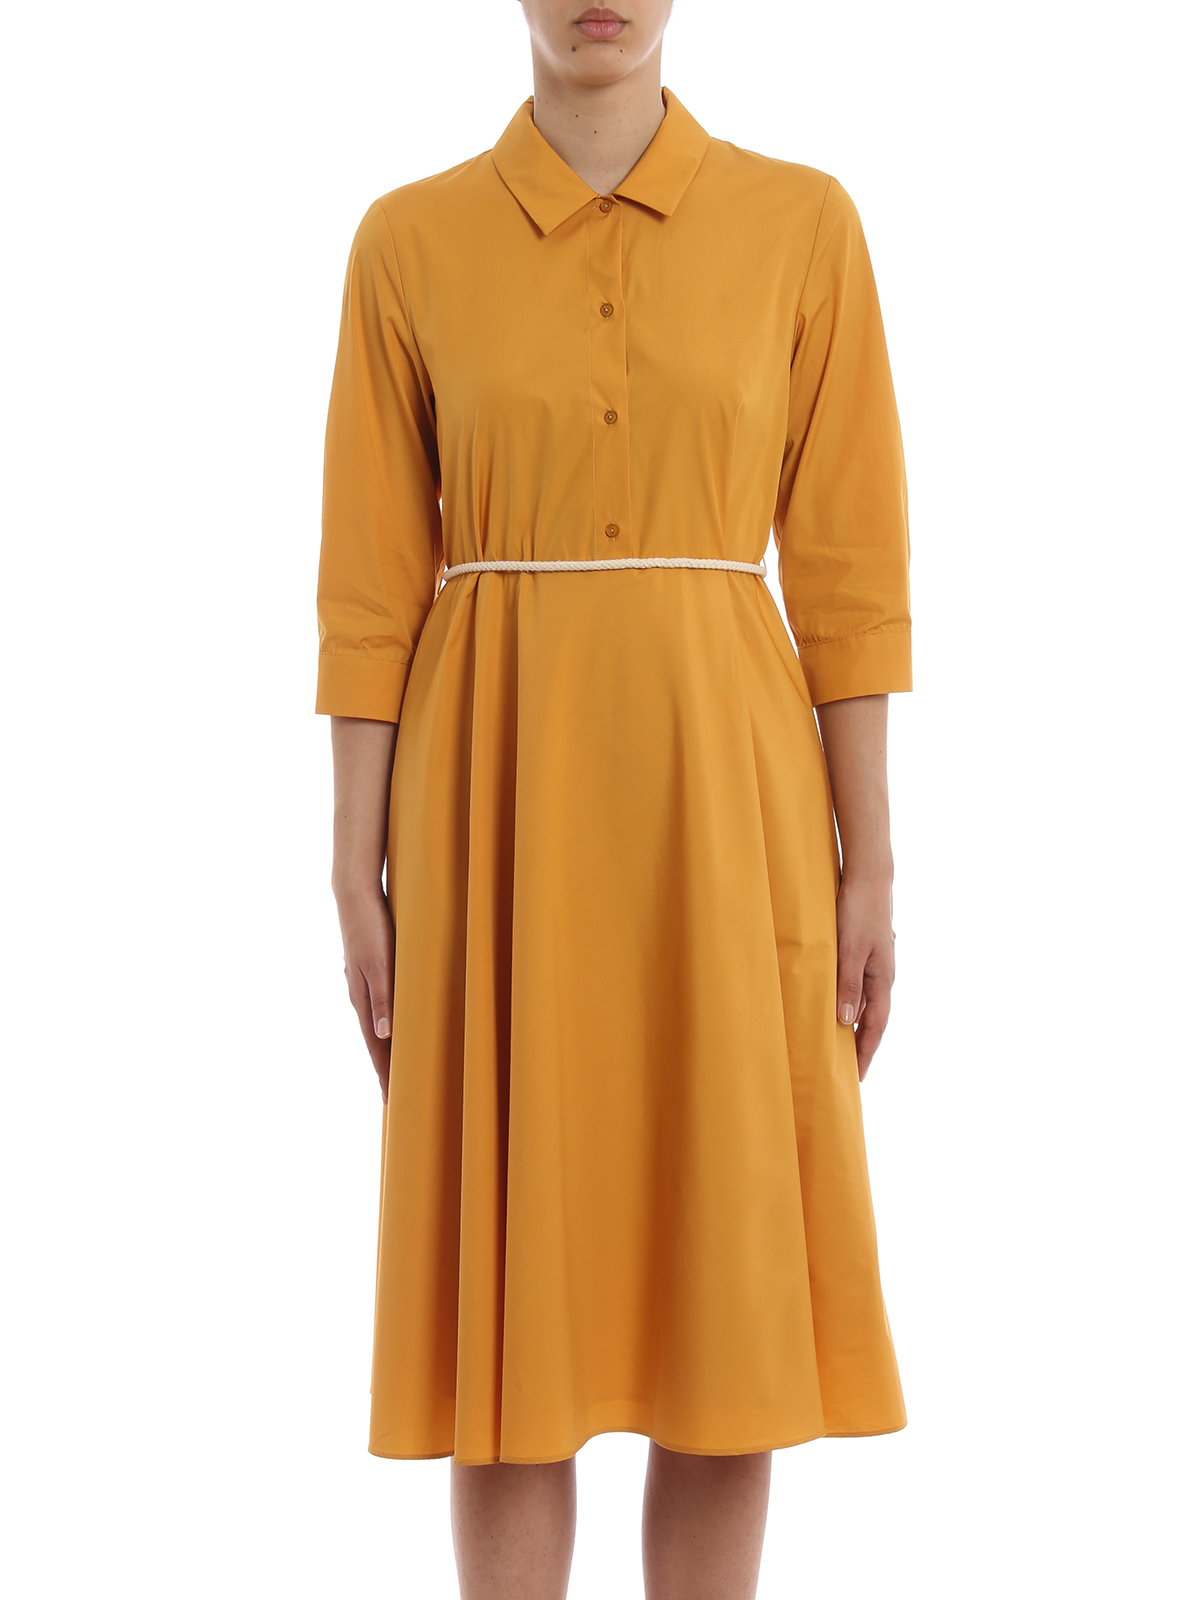 max mara - knielanges kleid - gelb - knielange kleider